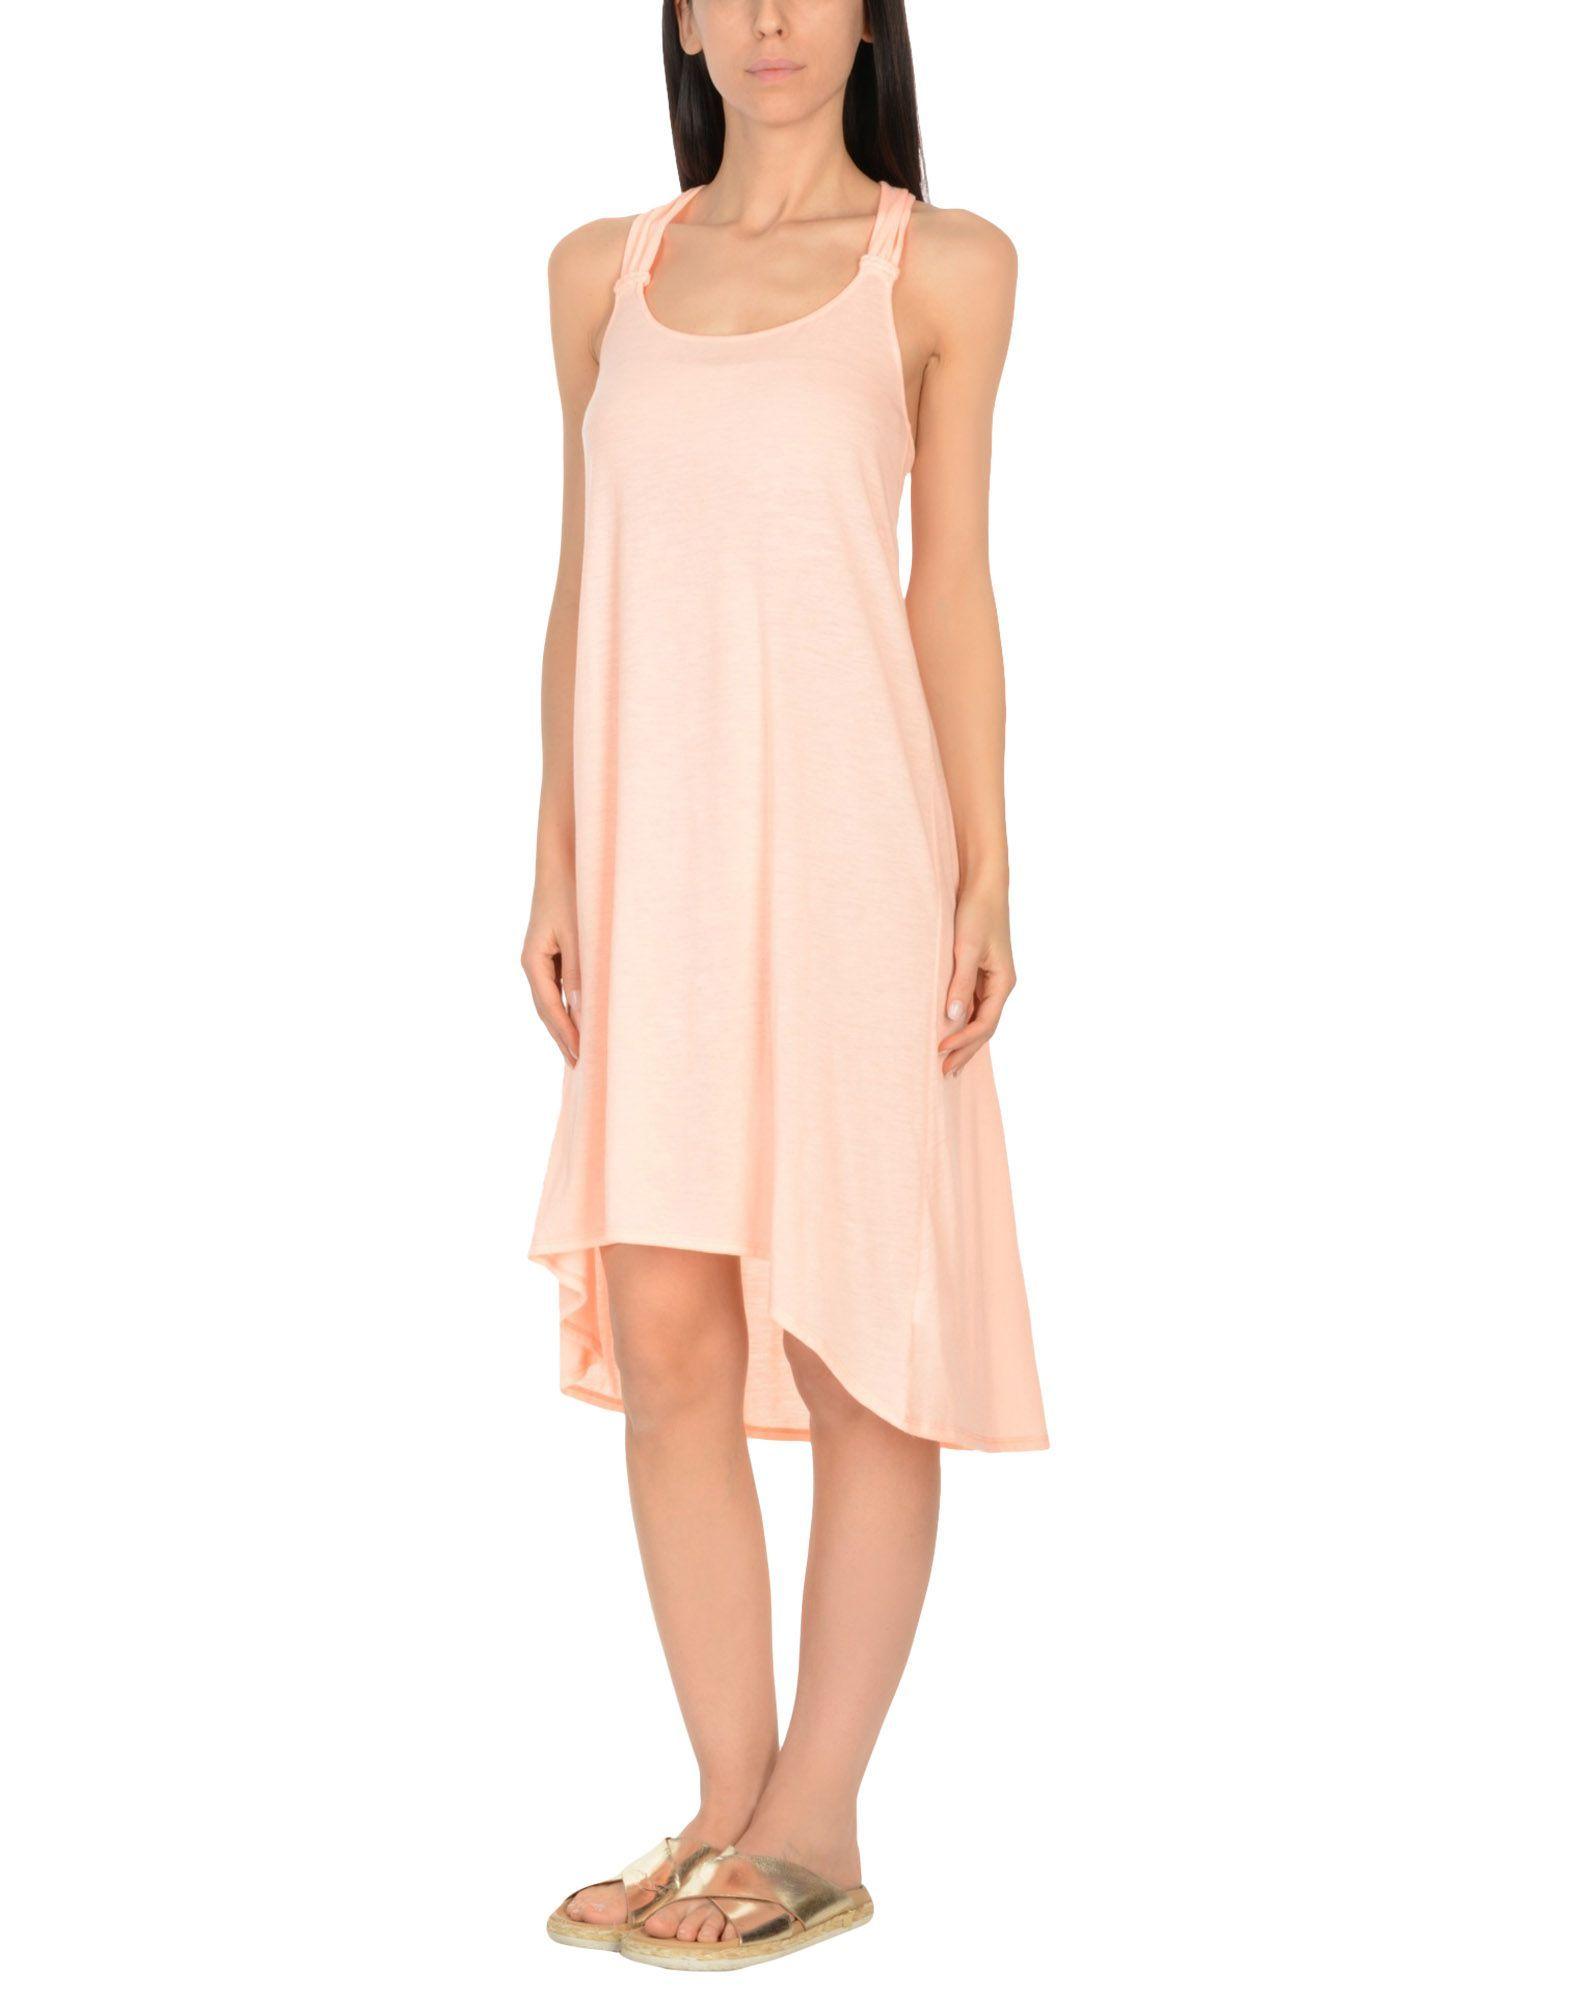 Heidi Klein Salmon Pink Jersey Beach Dress